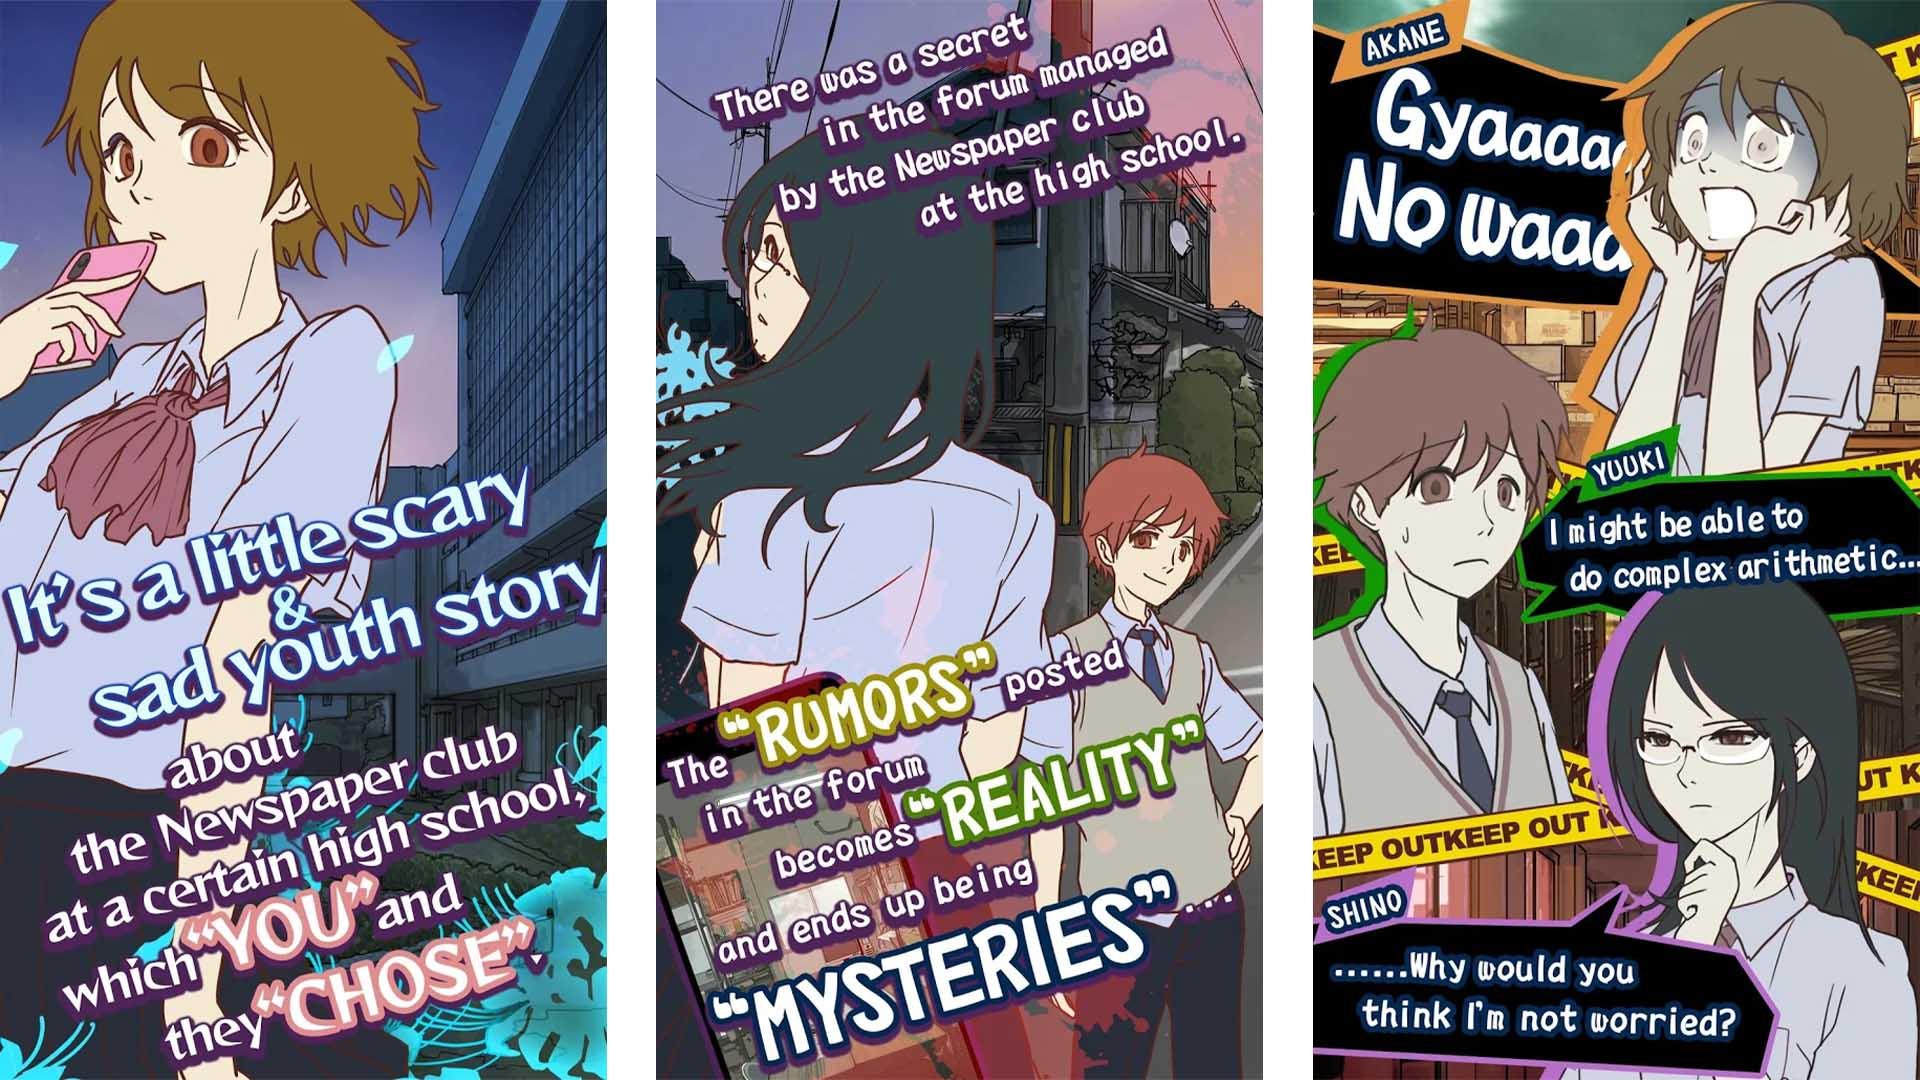 Mysterious Forum and 7 Rumors screenshot